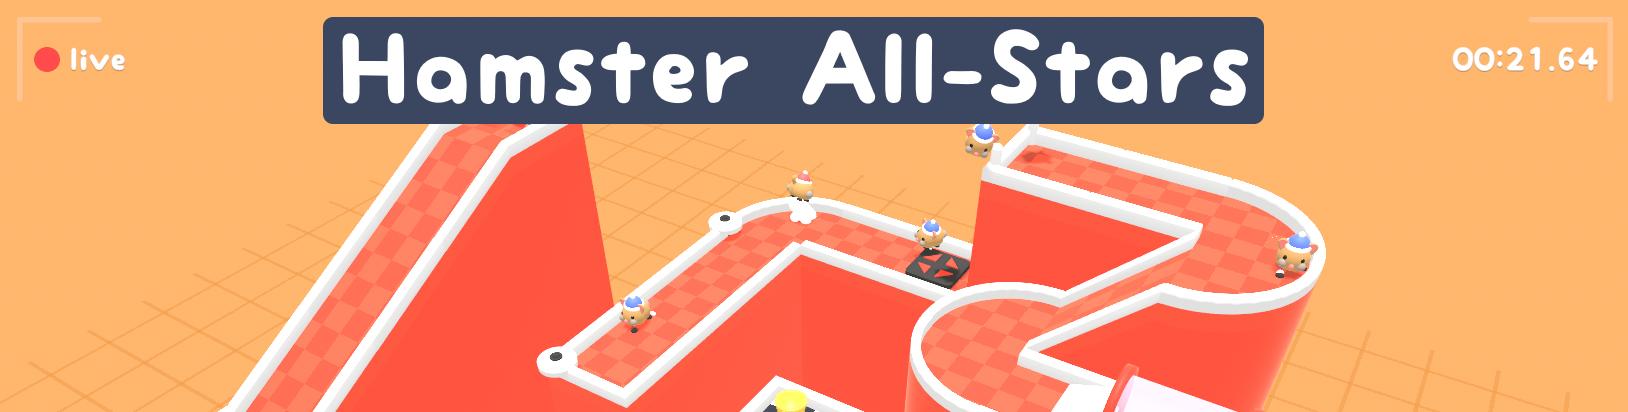 Hamster All-Stars